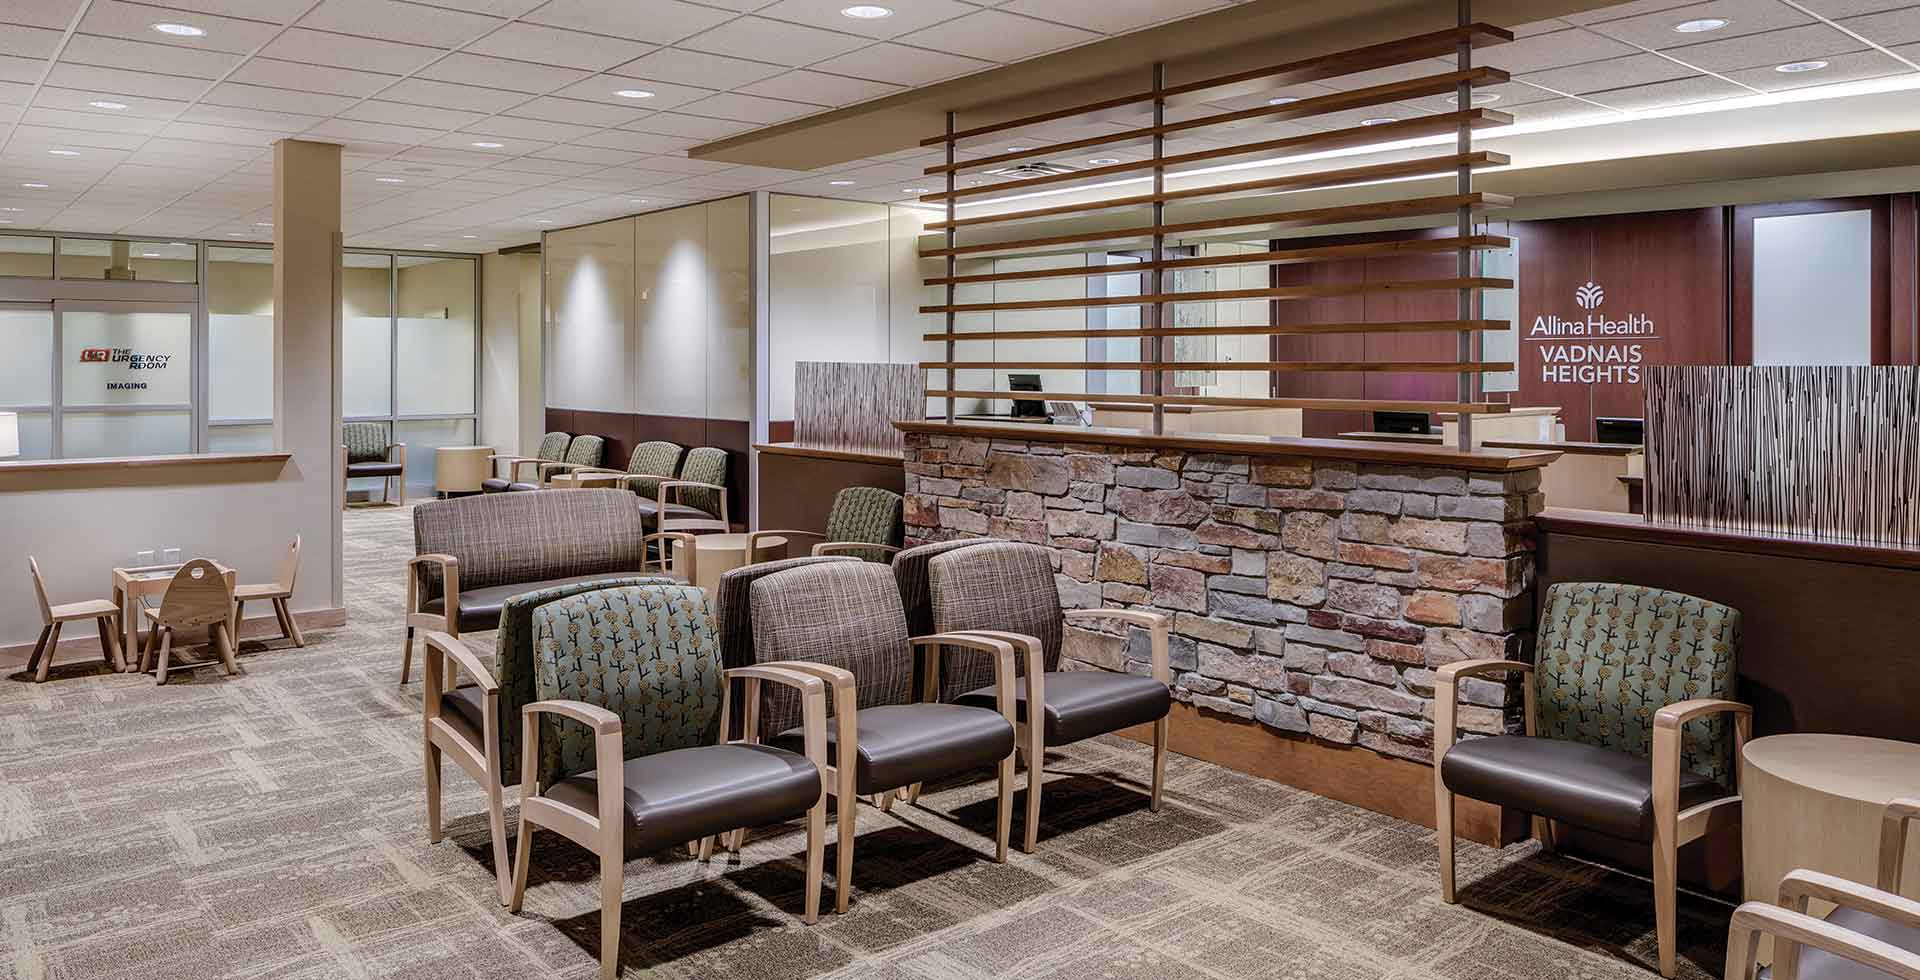 davis-healthcare-real-estate-group-image-04